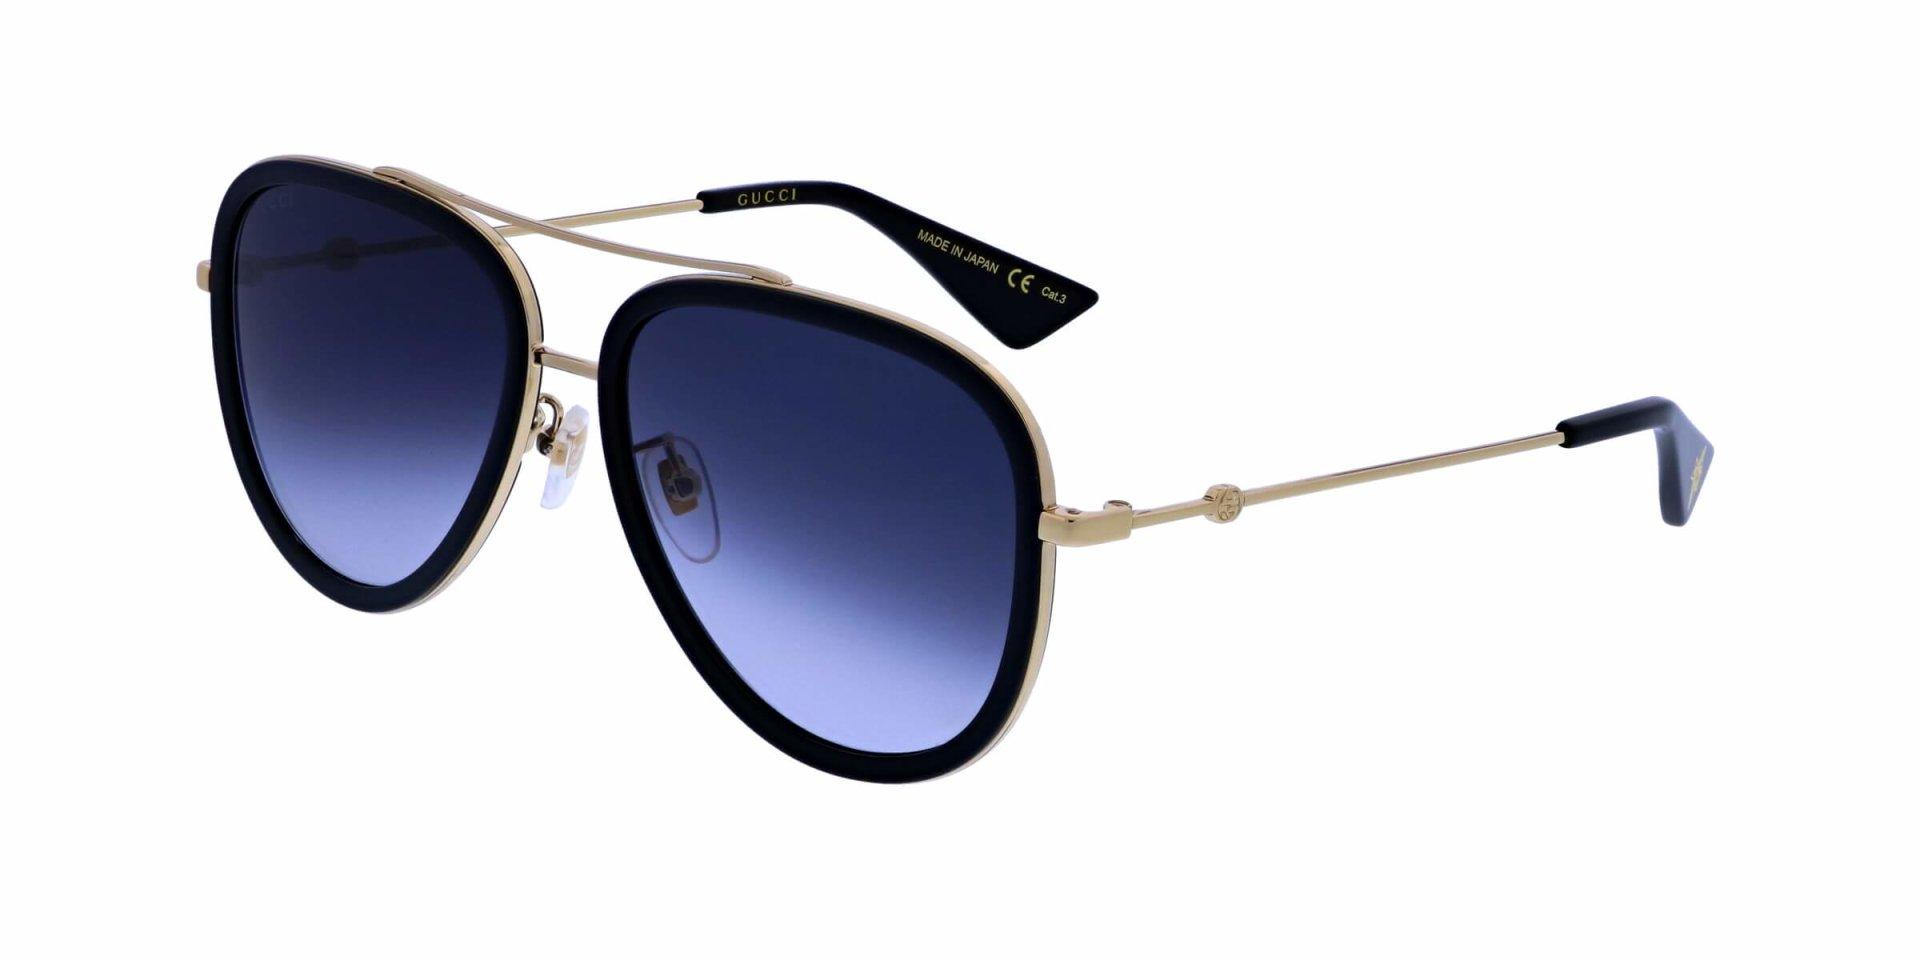 b6d26f516d1 Sunglasses GUCCI